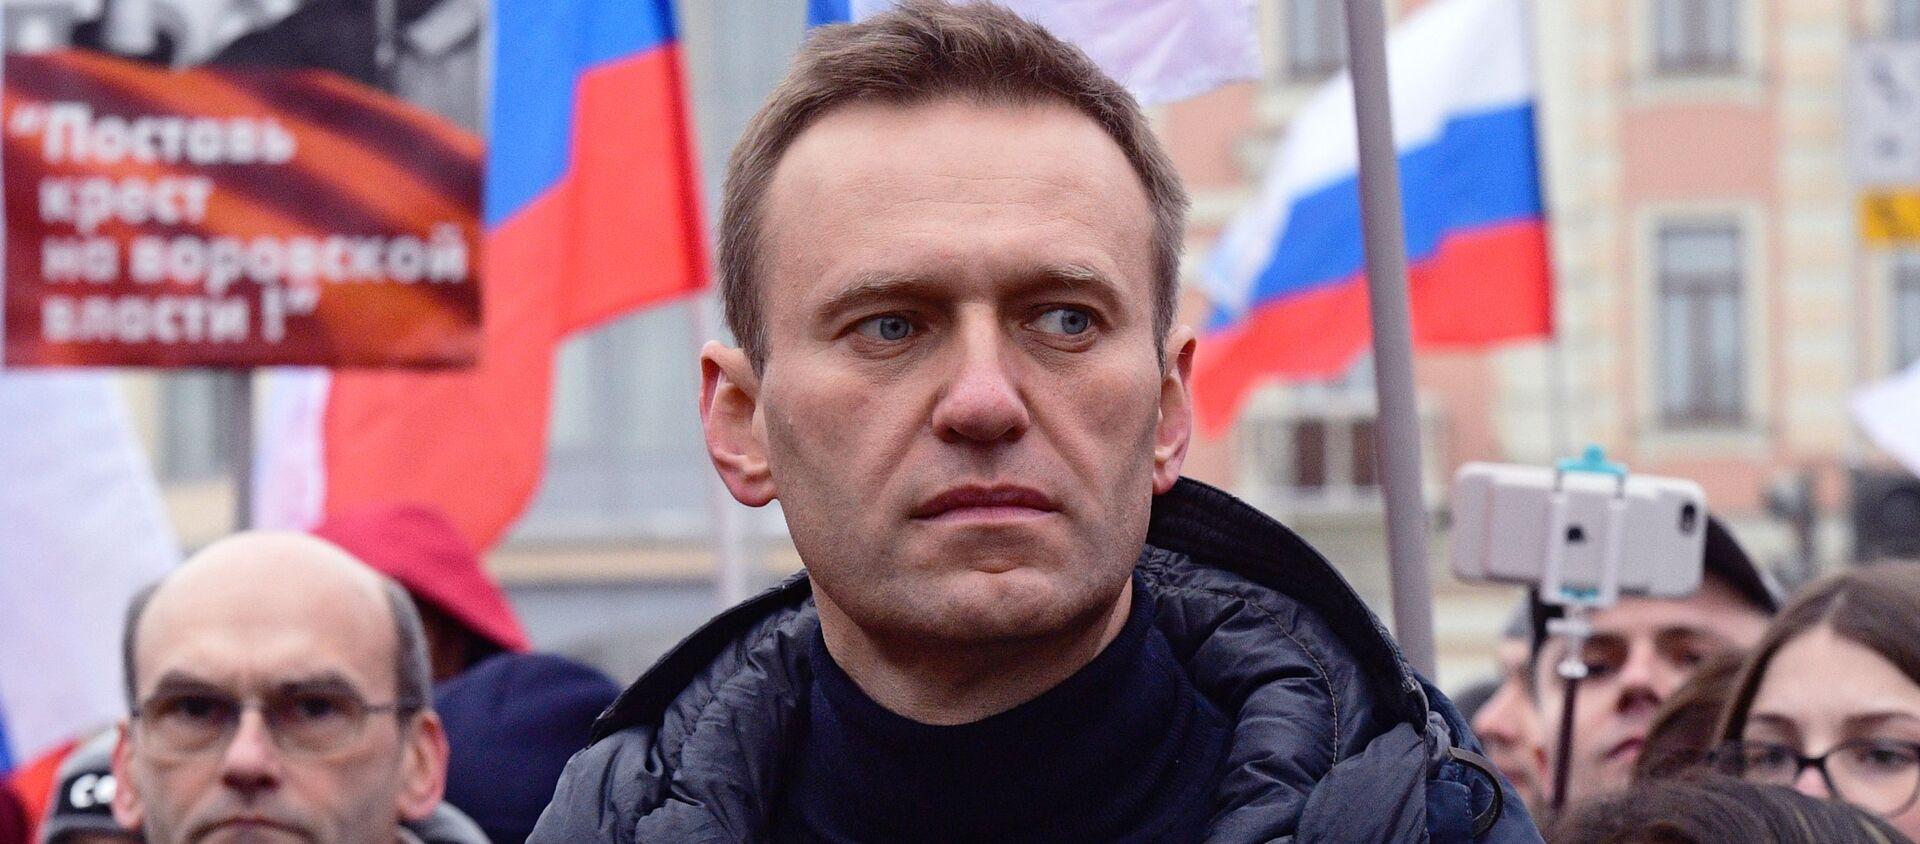 Alexéi Navalni, activista opositor ruso (archivo) - Sputnik Mundo, 1920, 23.01.2021